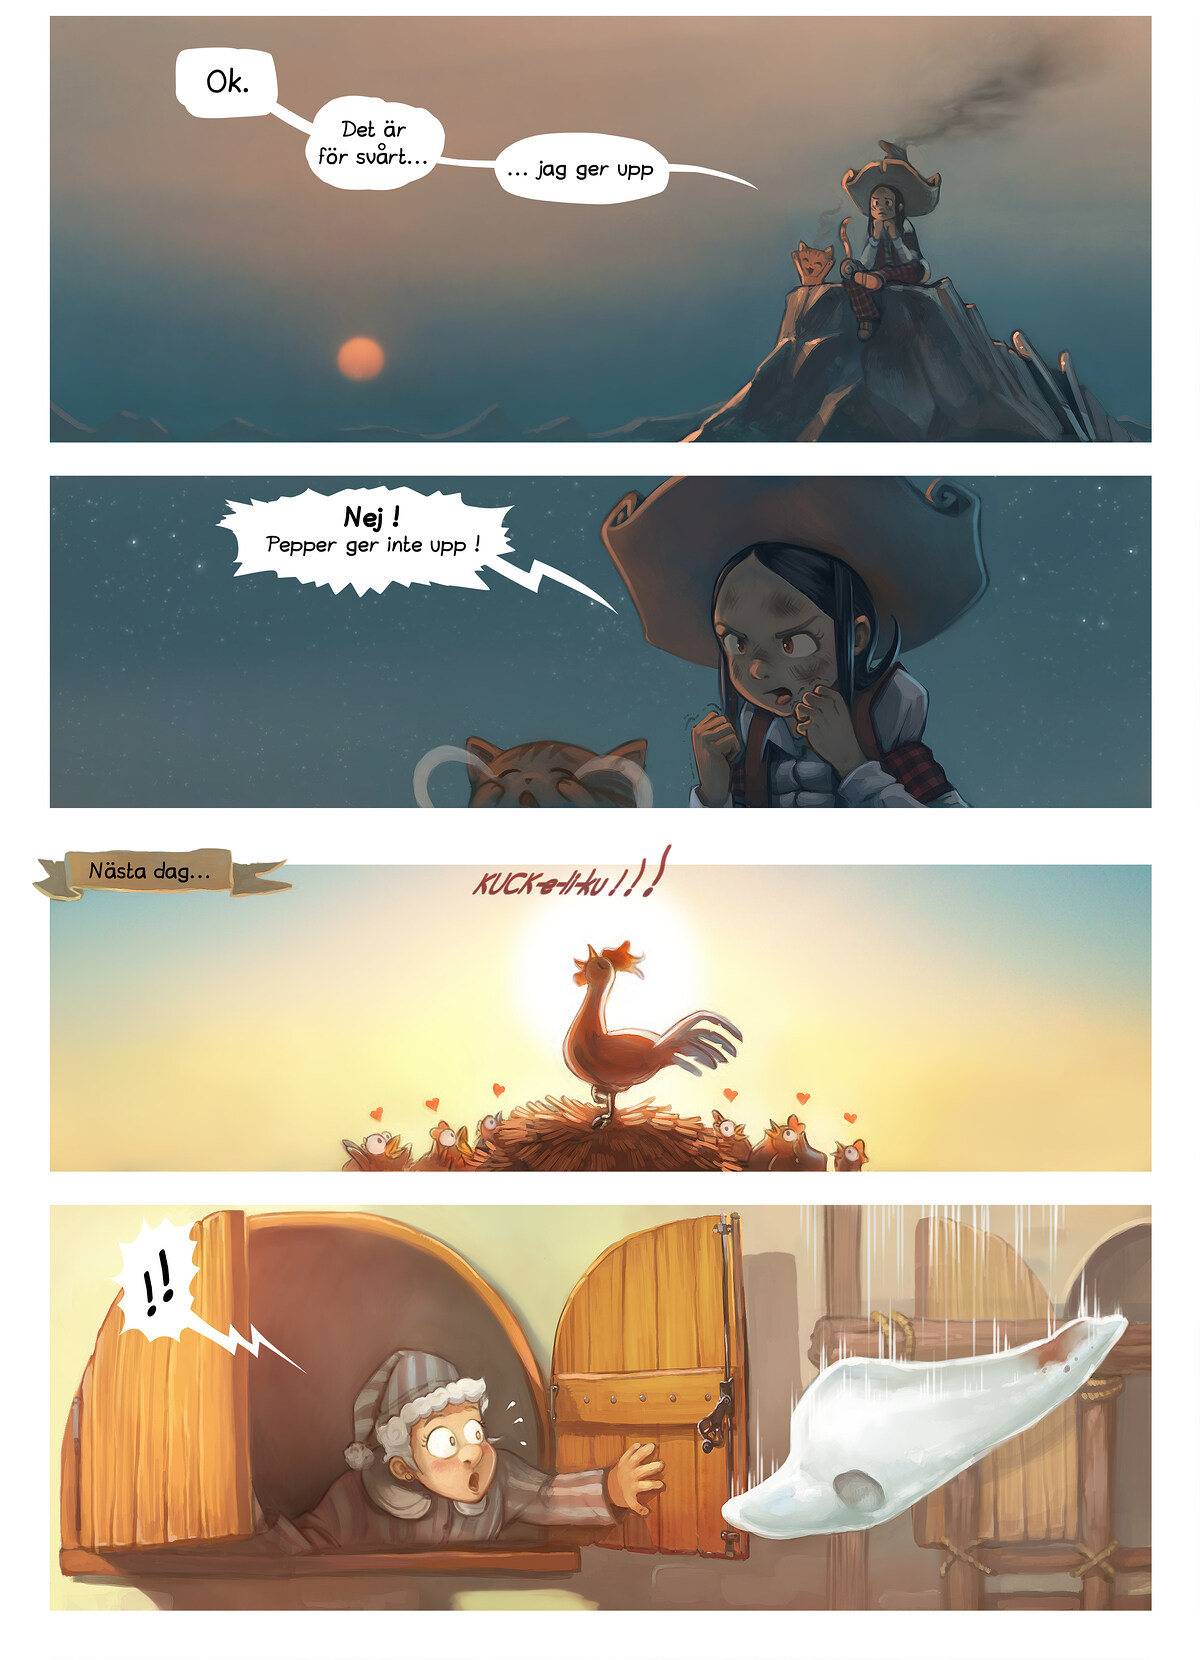 Episode 14: Draktanden, Page 5